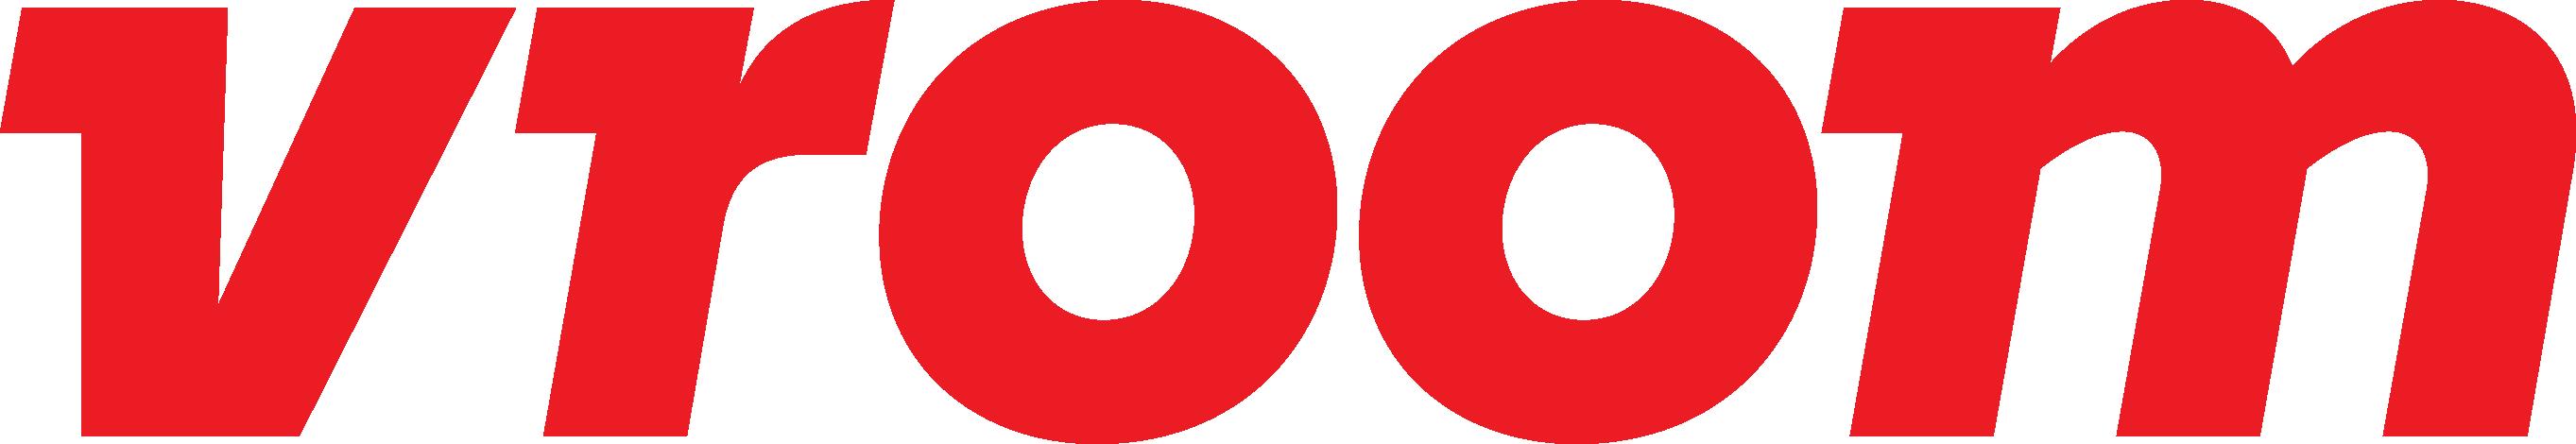 IPO Vroom